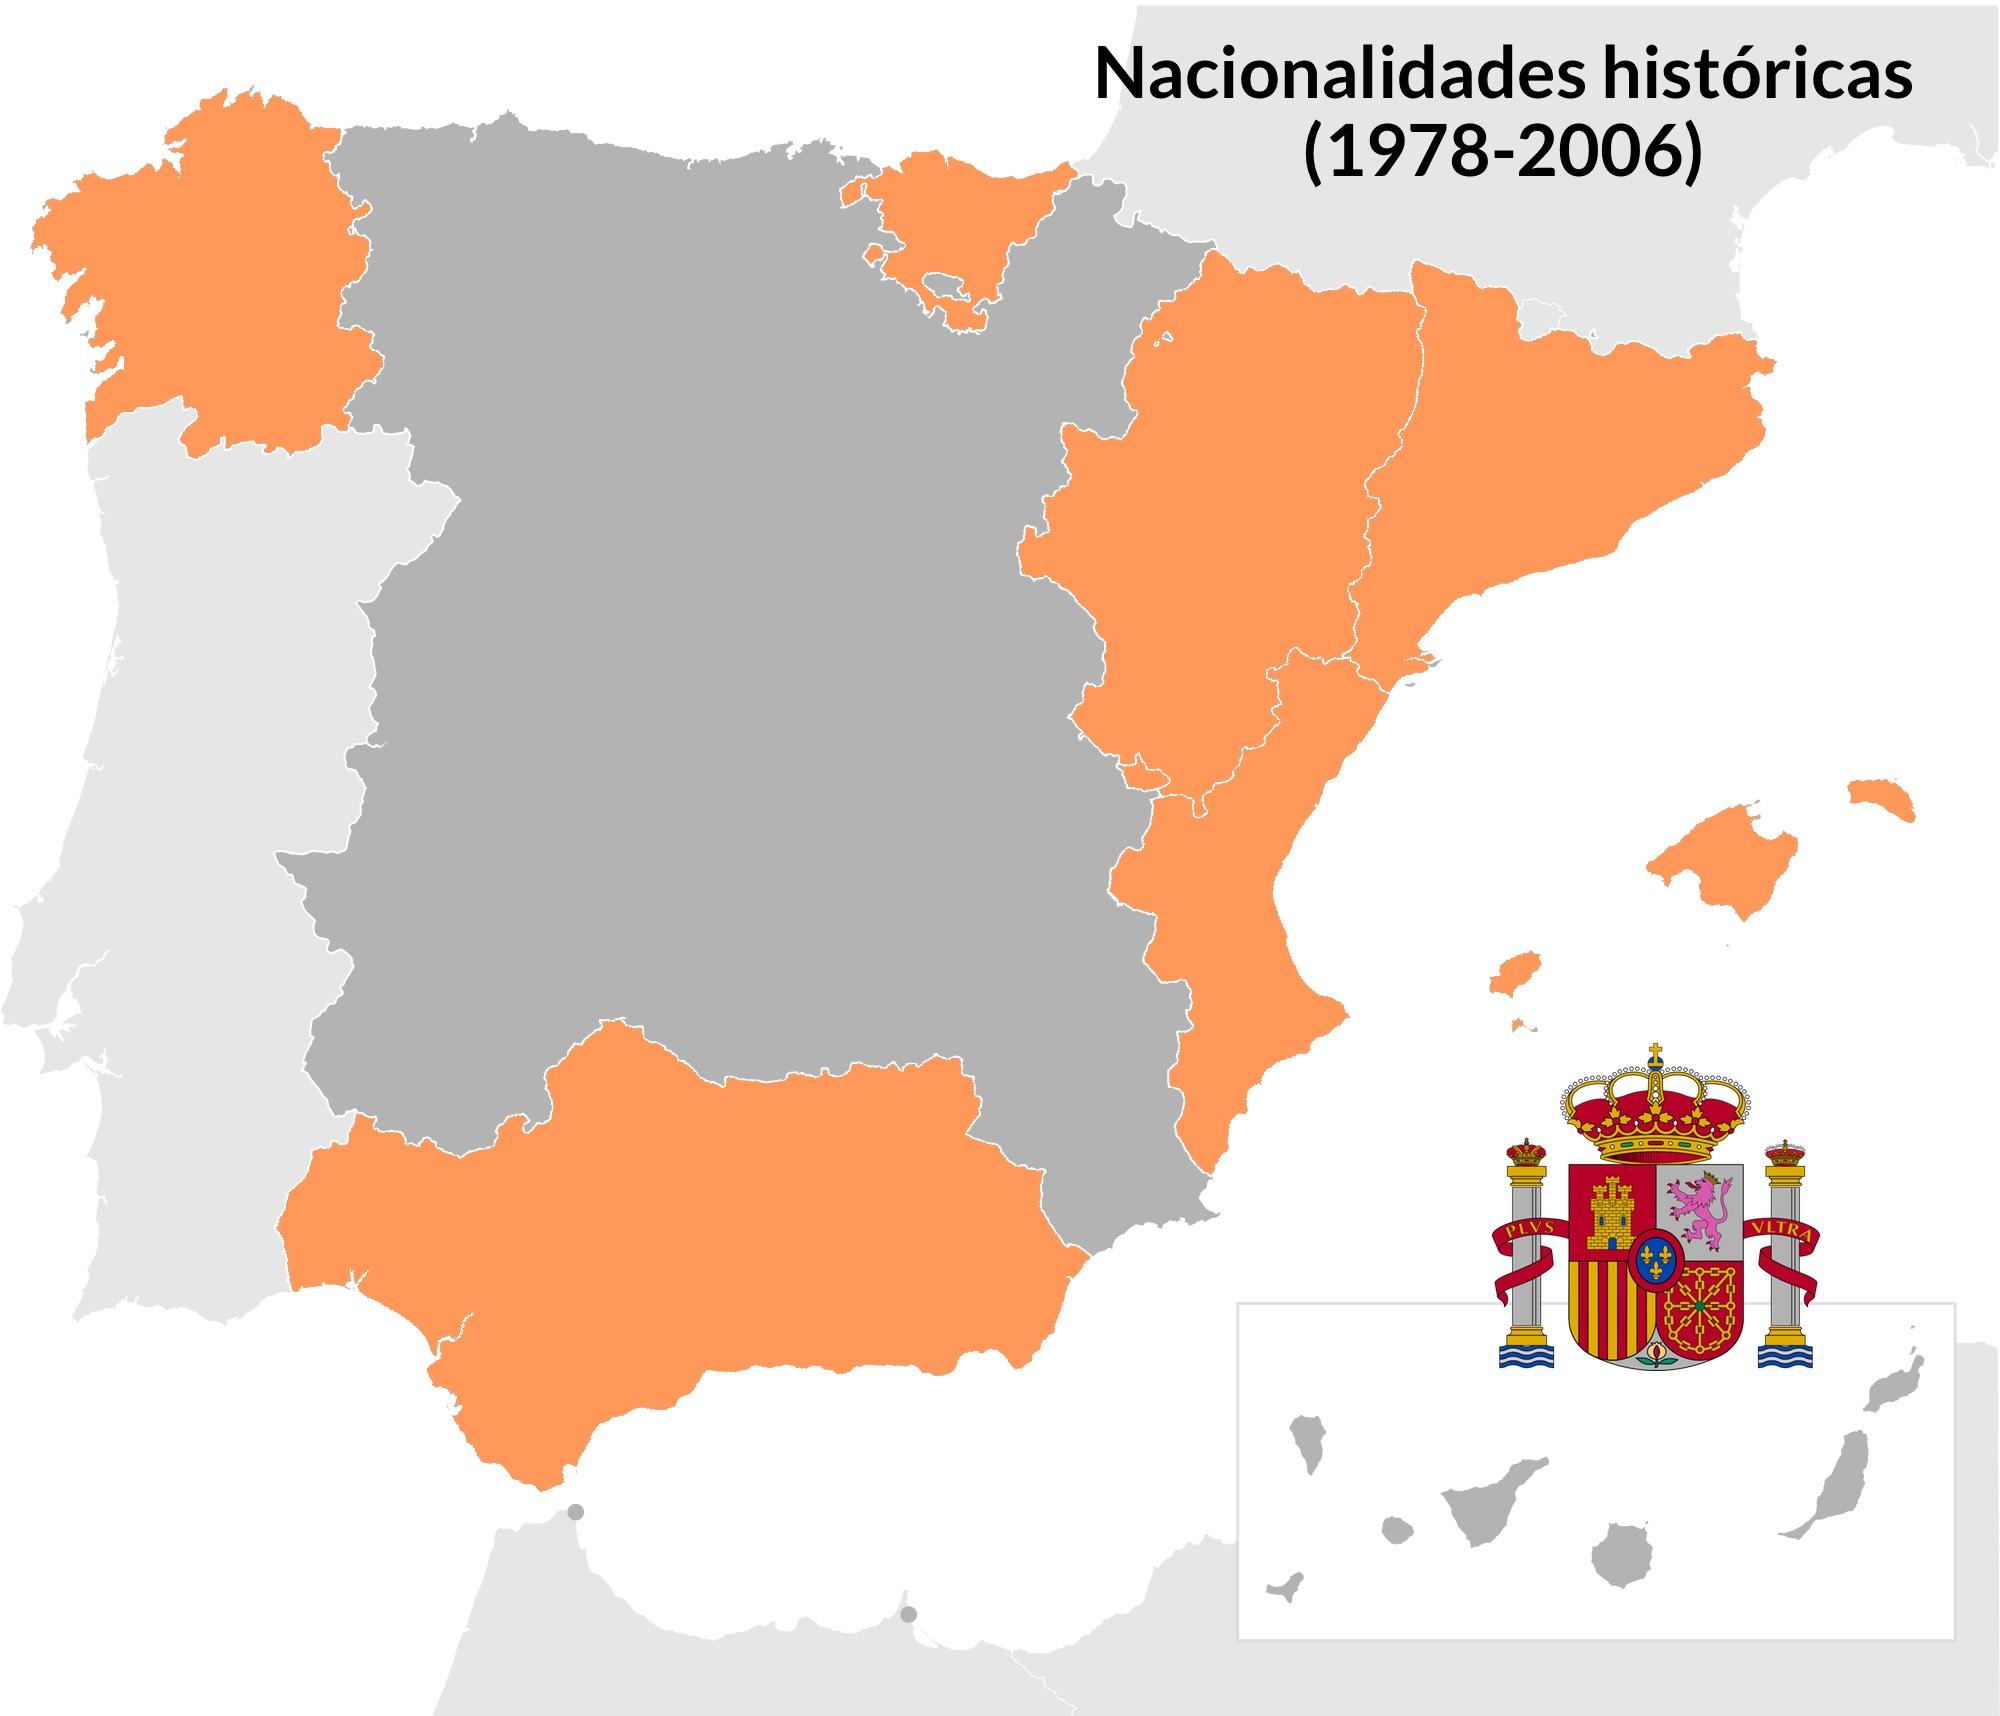 7-Nacionalidades Historicas